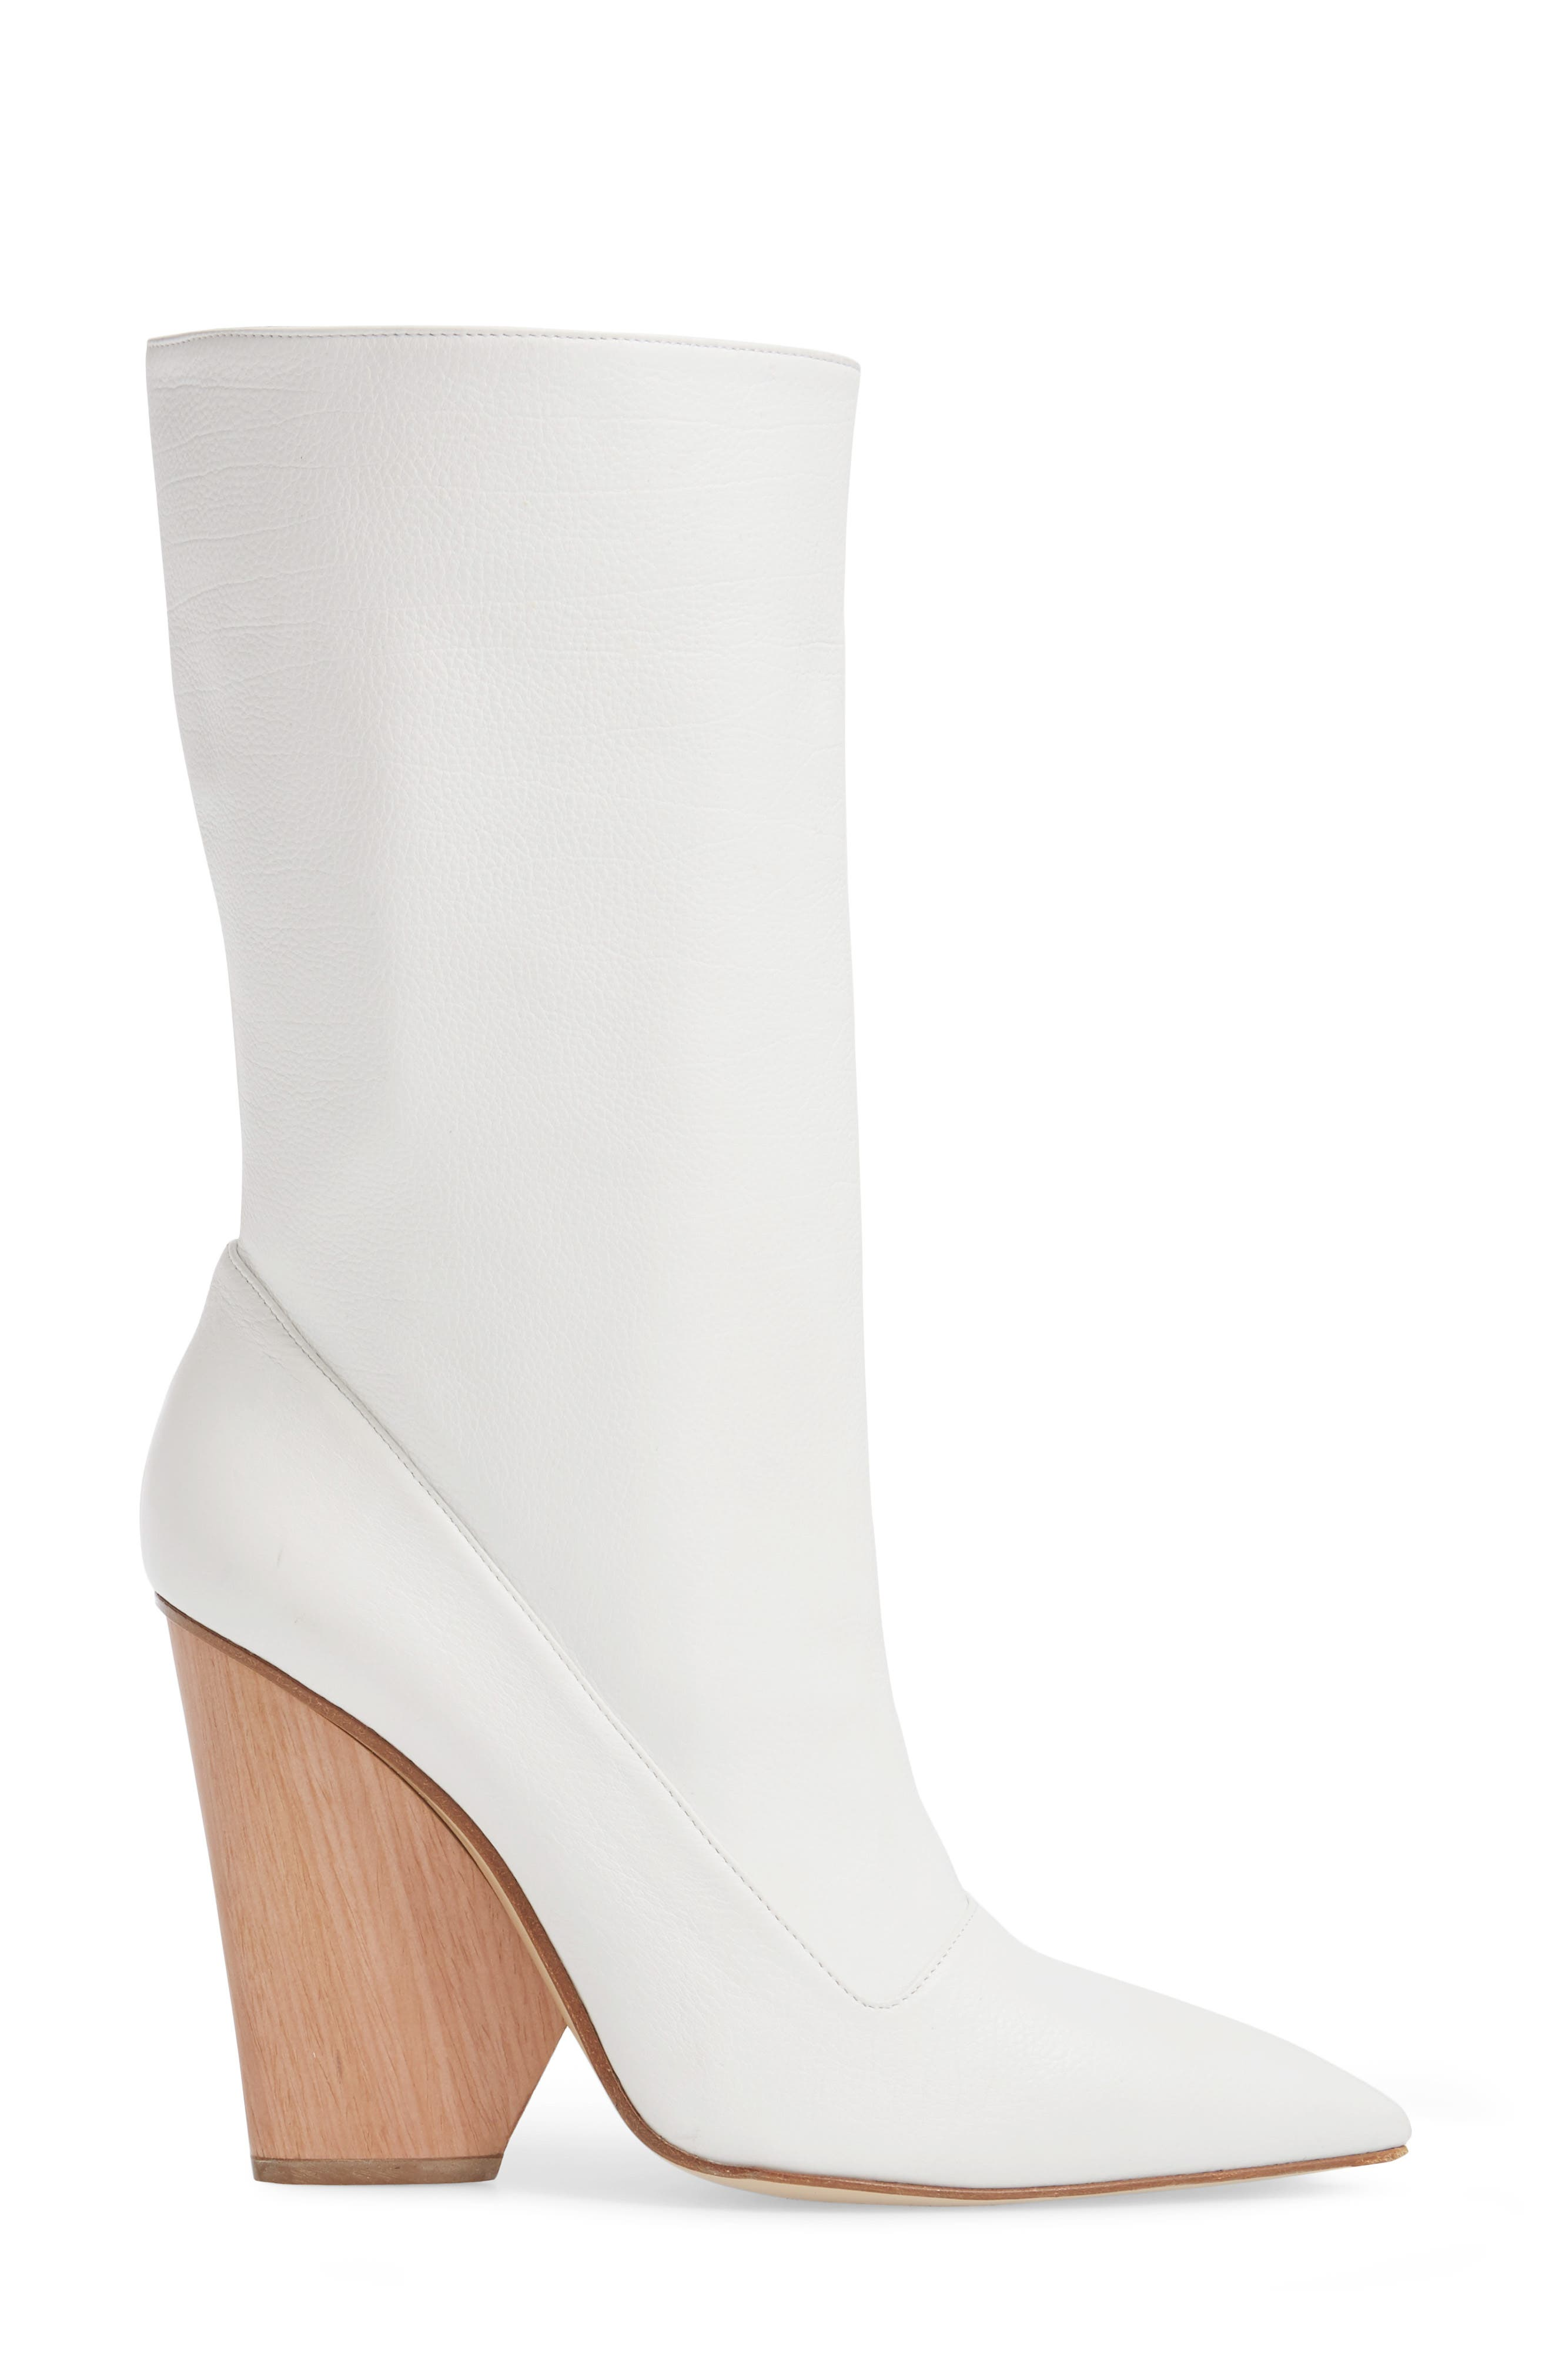 Alternate Image 3  - Paul Andrew Judd Pointy Toe Boot (Women)